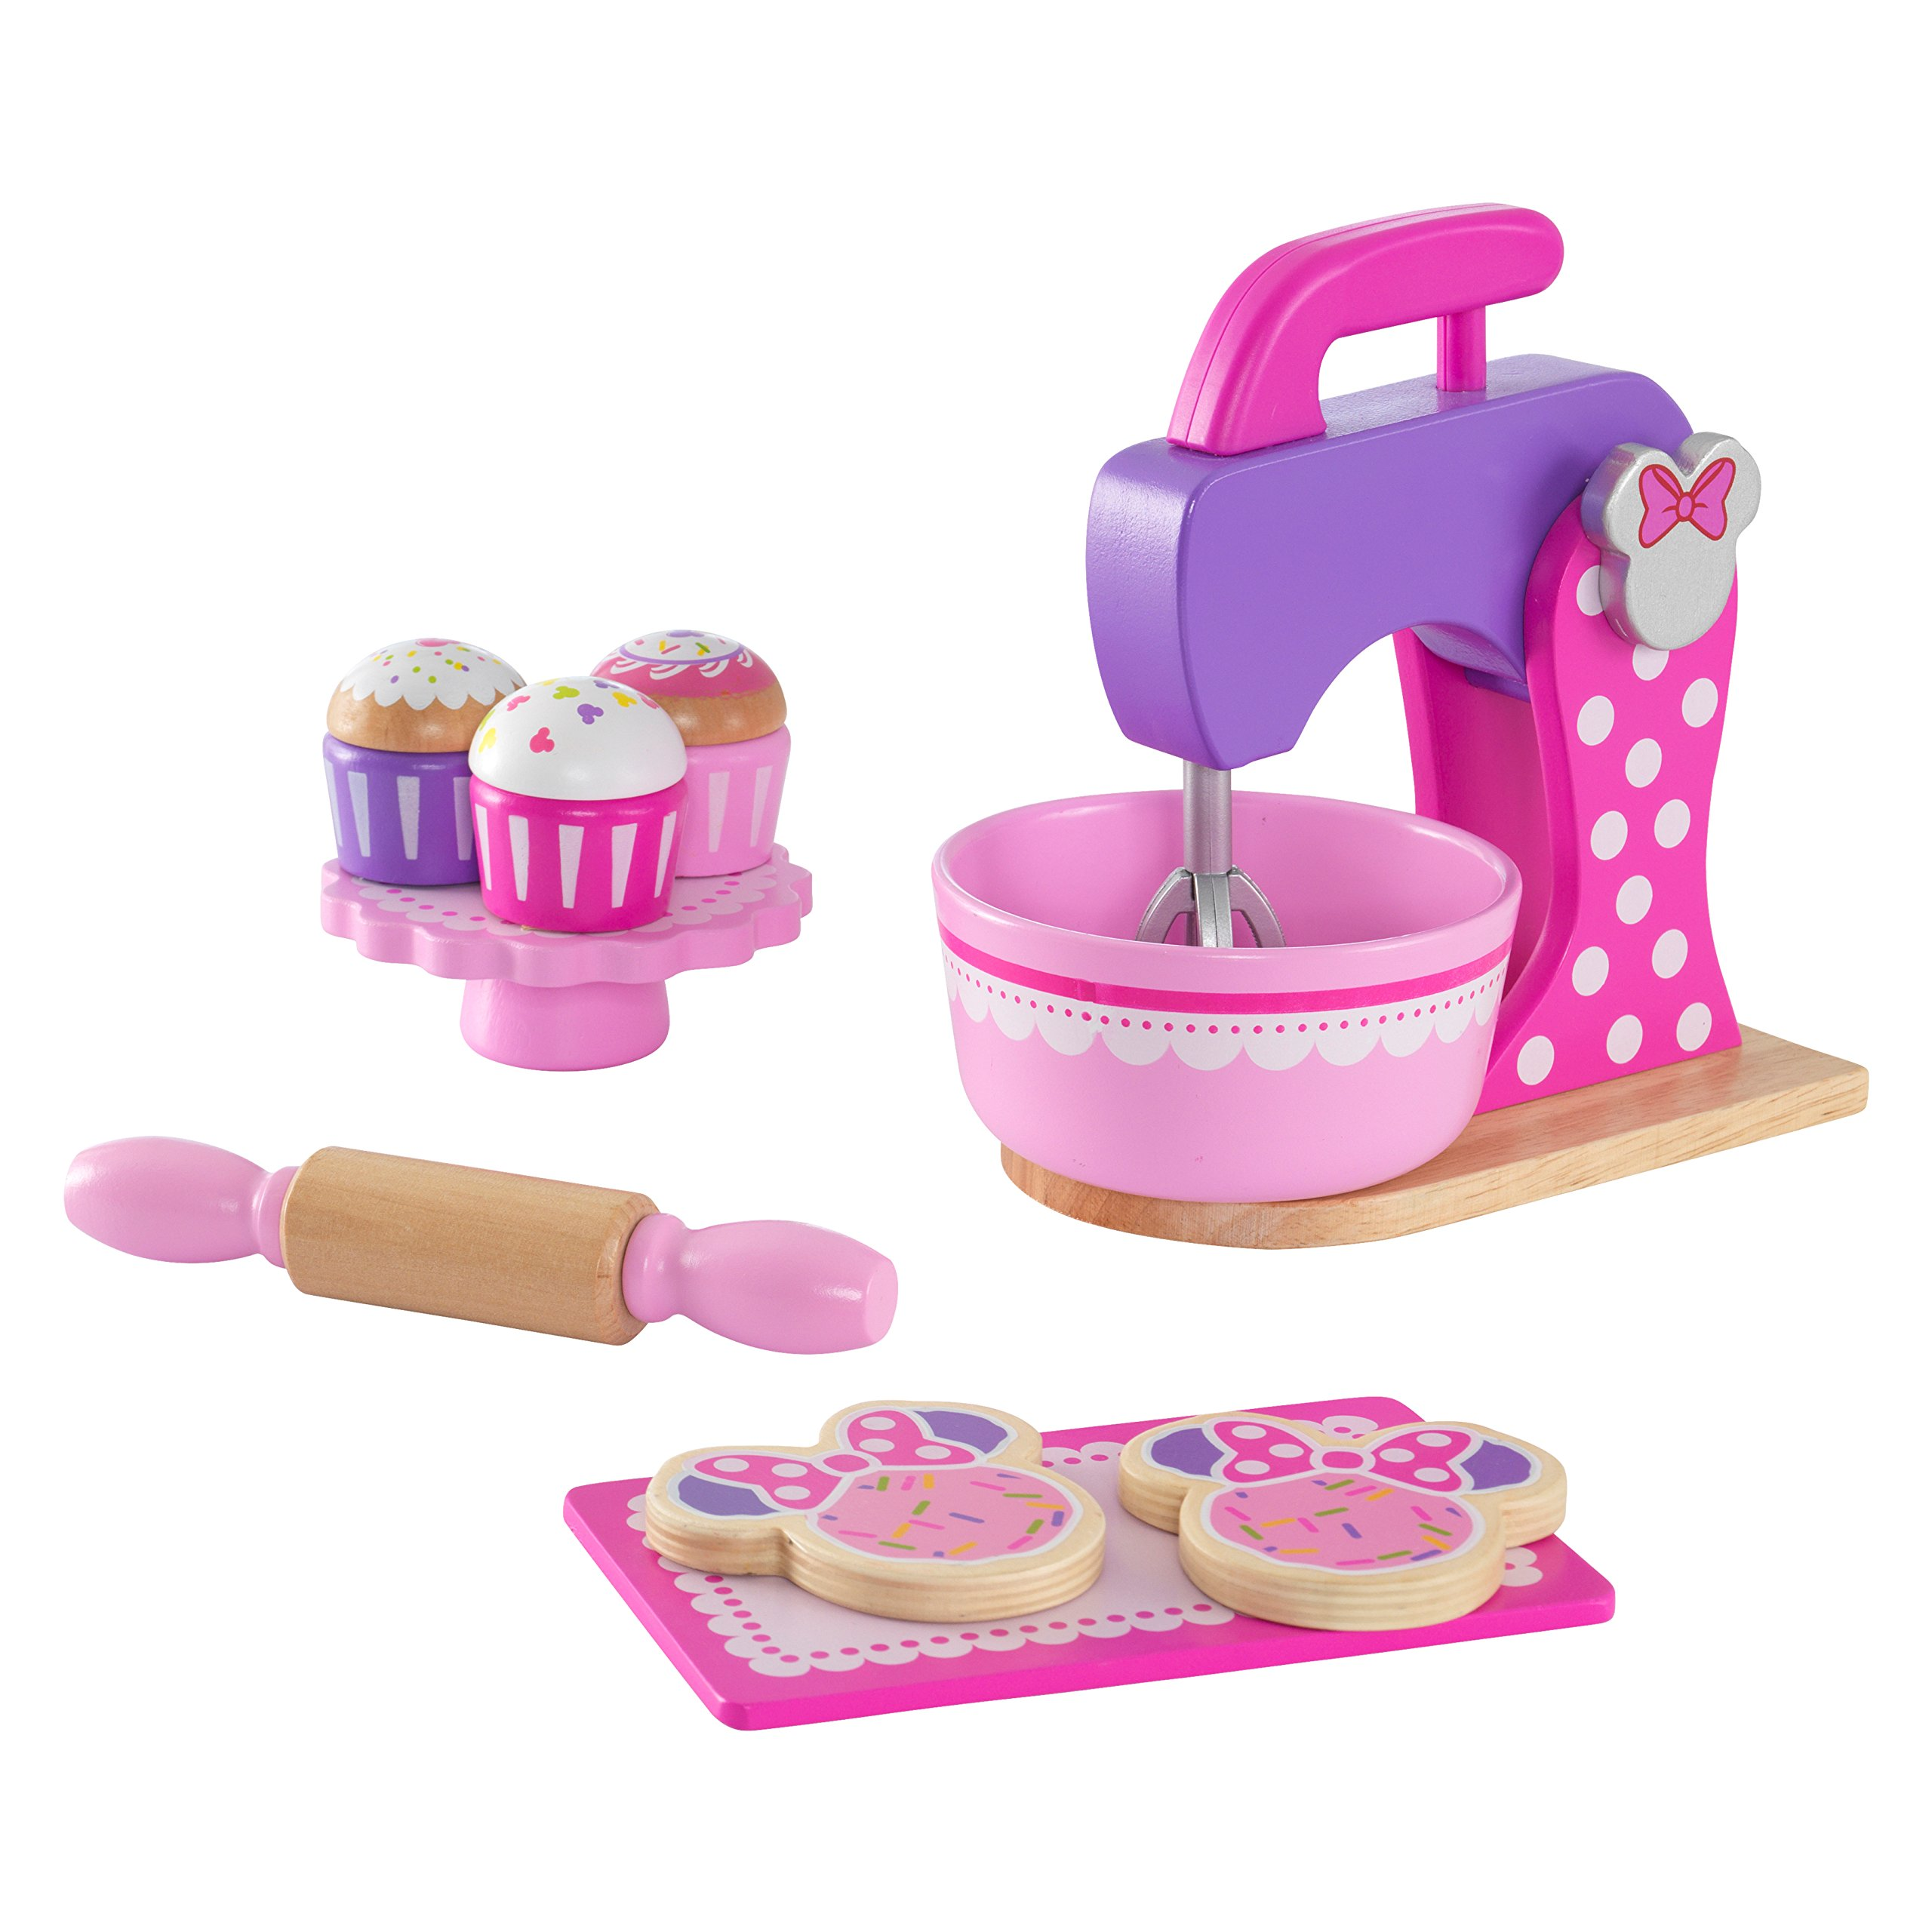 KidKraft Baking Accessories Set